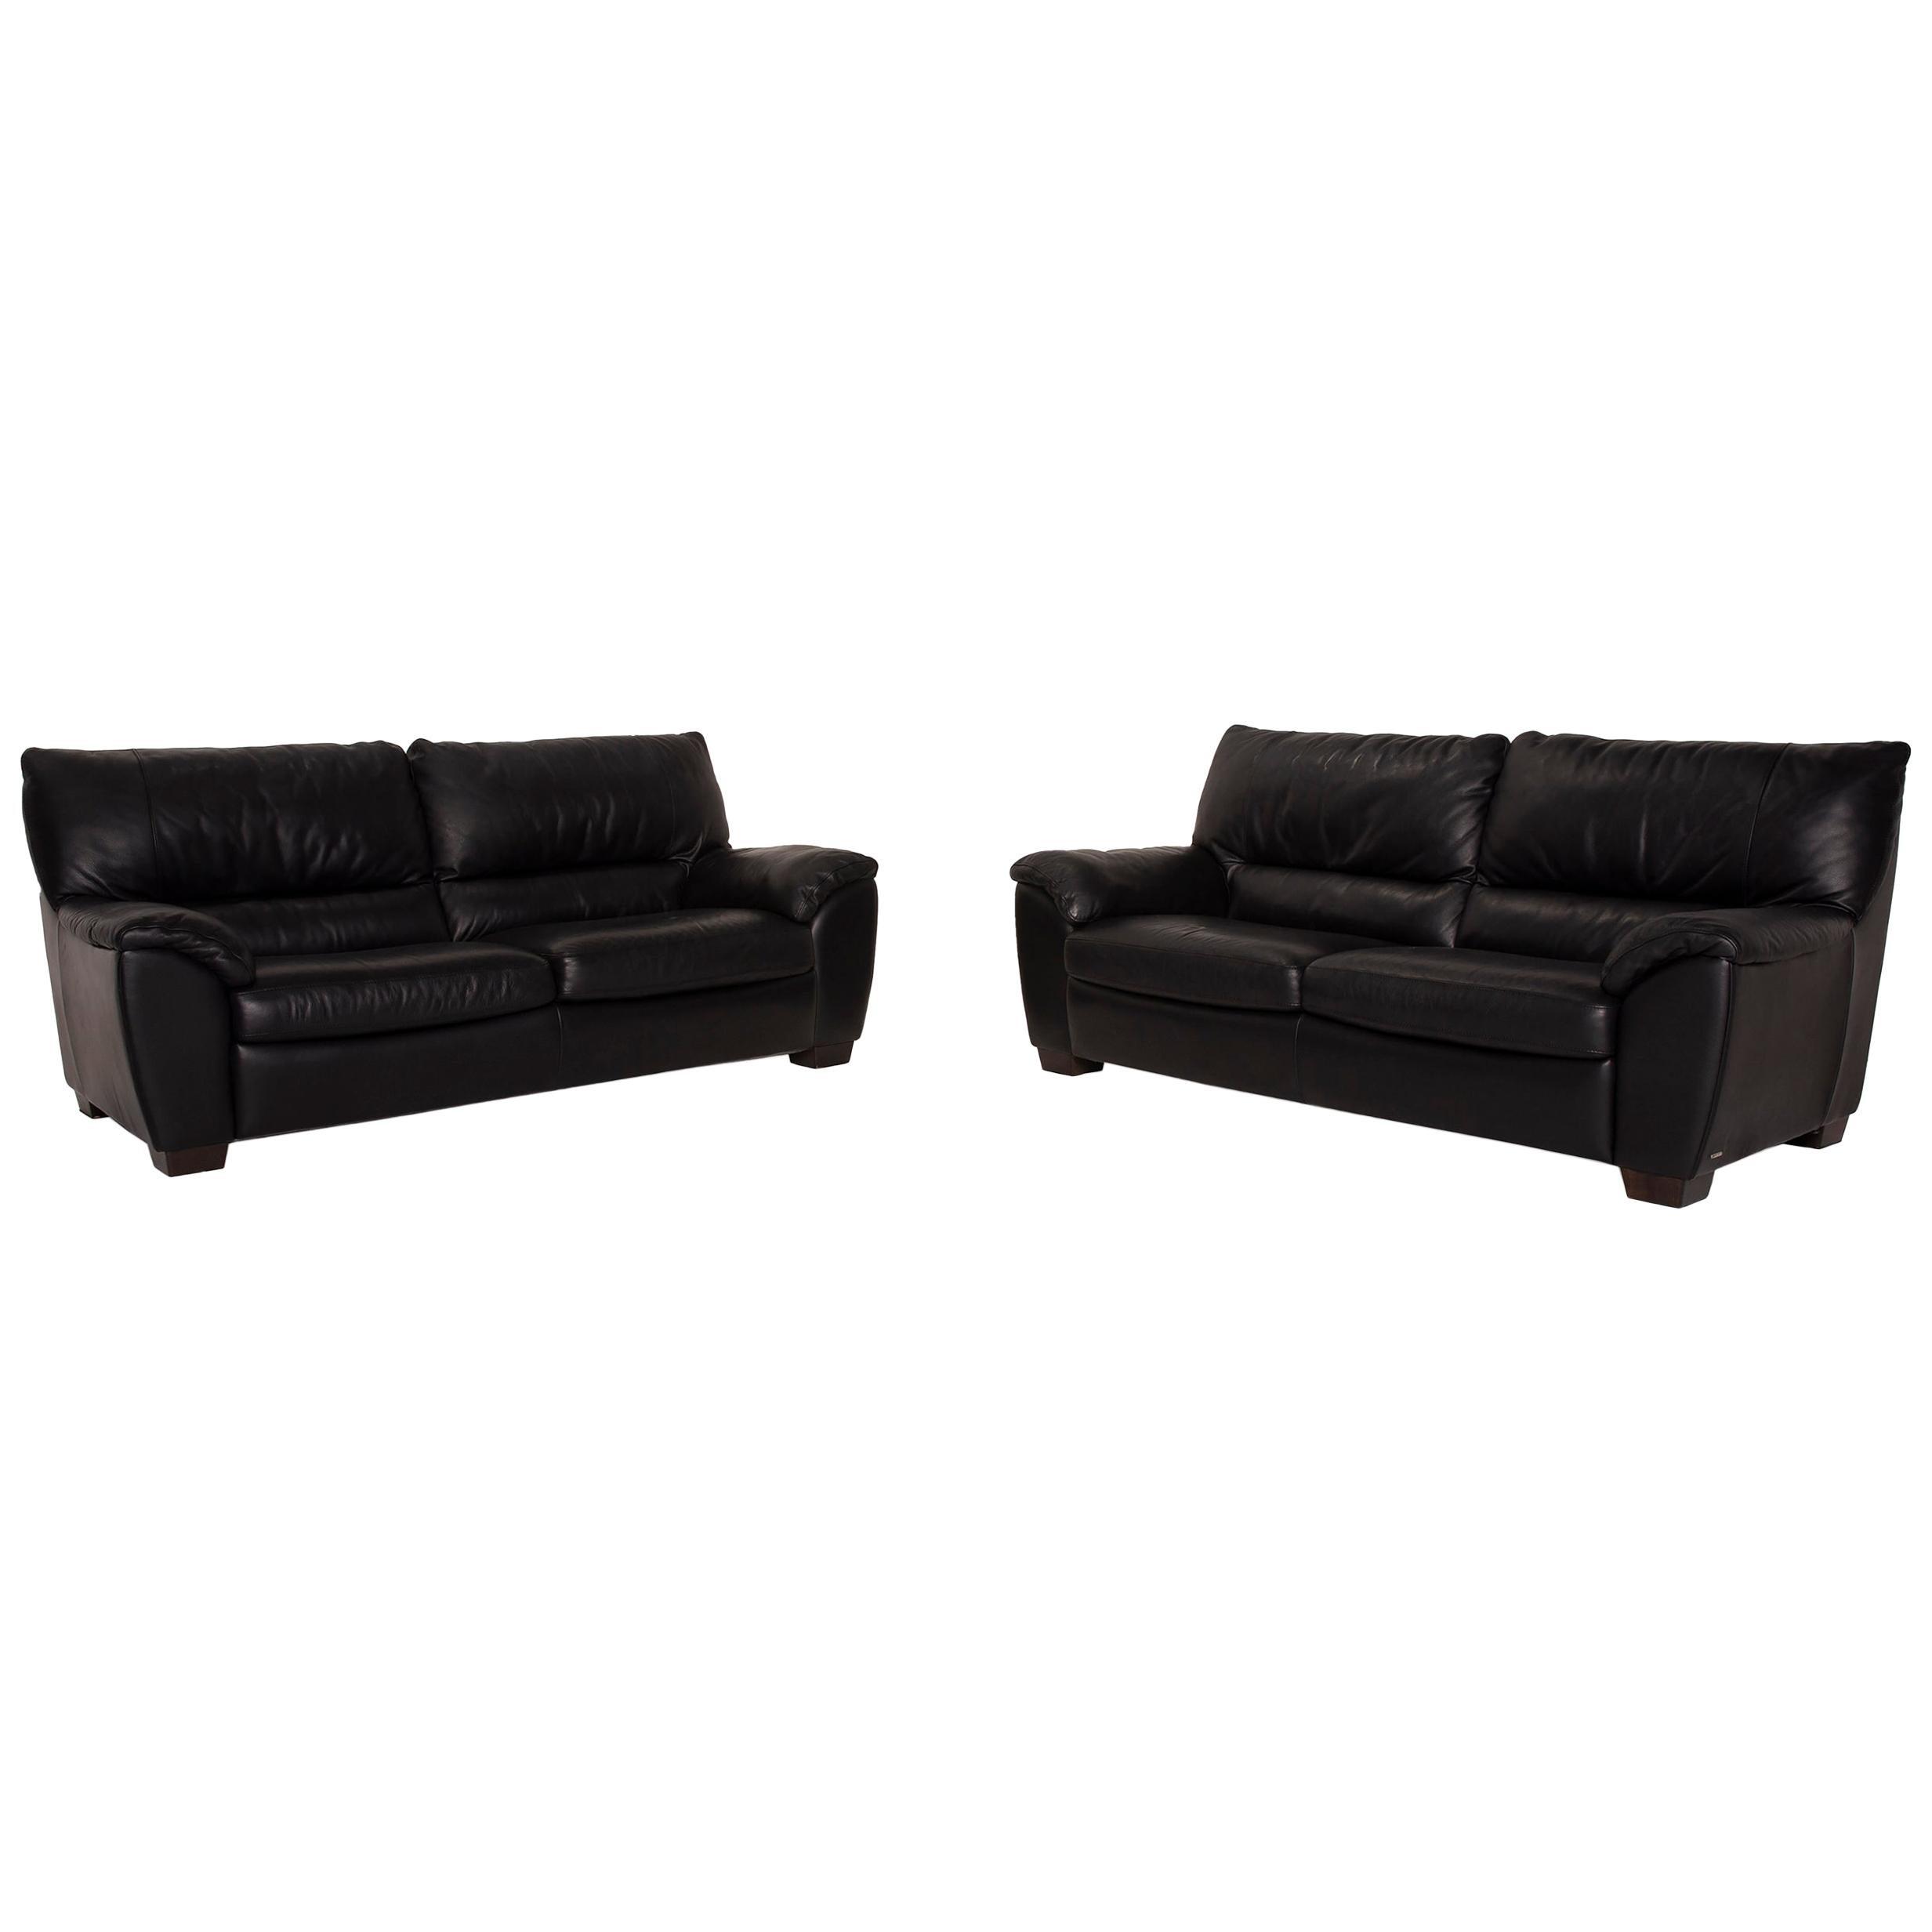 Natuzzi Two-Seater Leather Sofa Set Black 2x Two-Seater